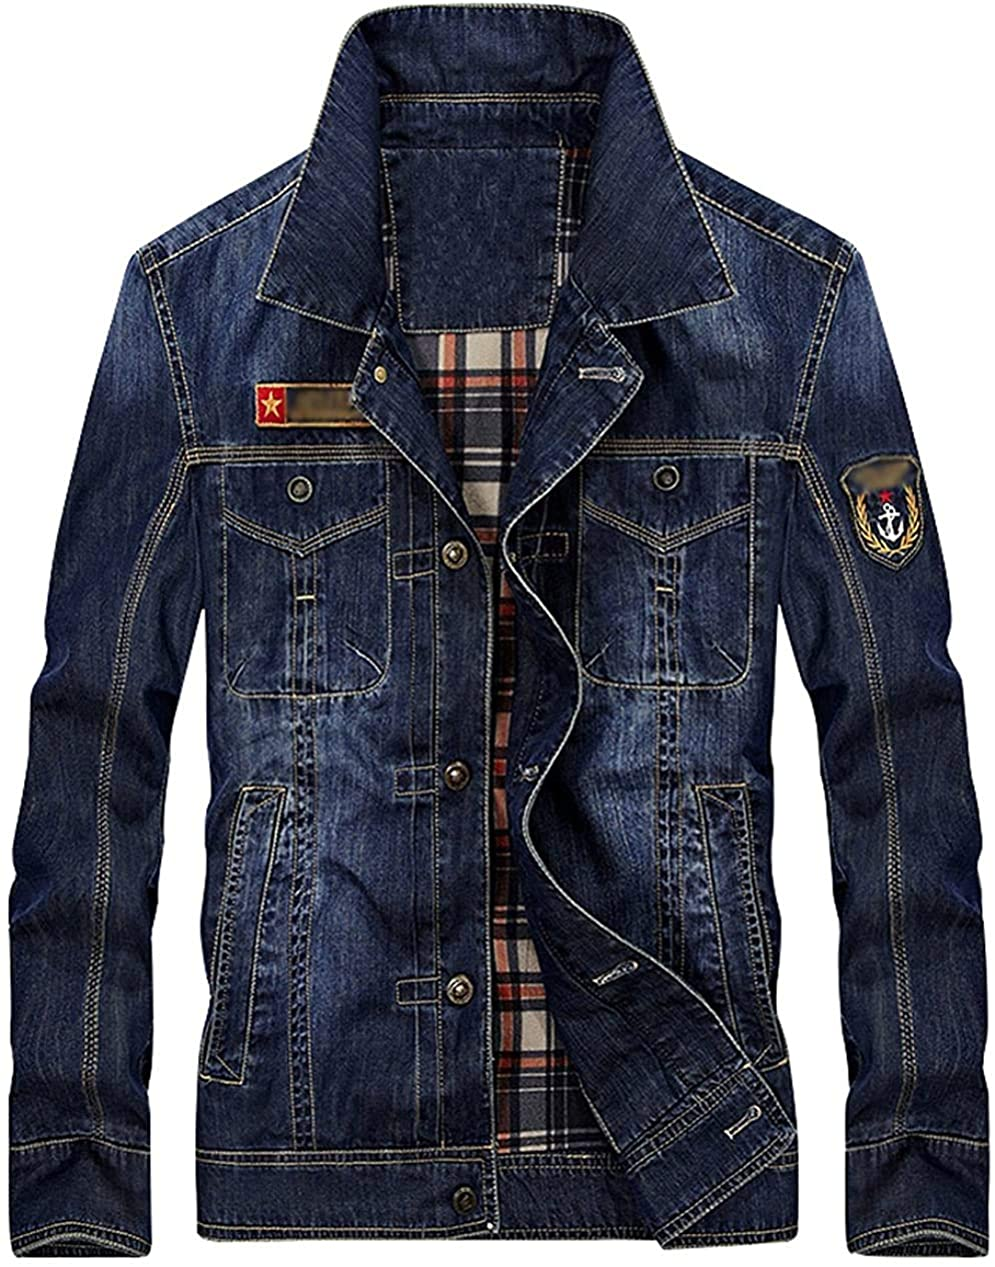 Xudcufyhu Men's Casual Retro Lapel Long Sleeves Denim Jacket Outerwear